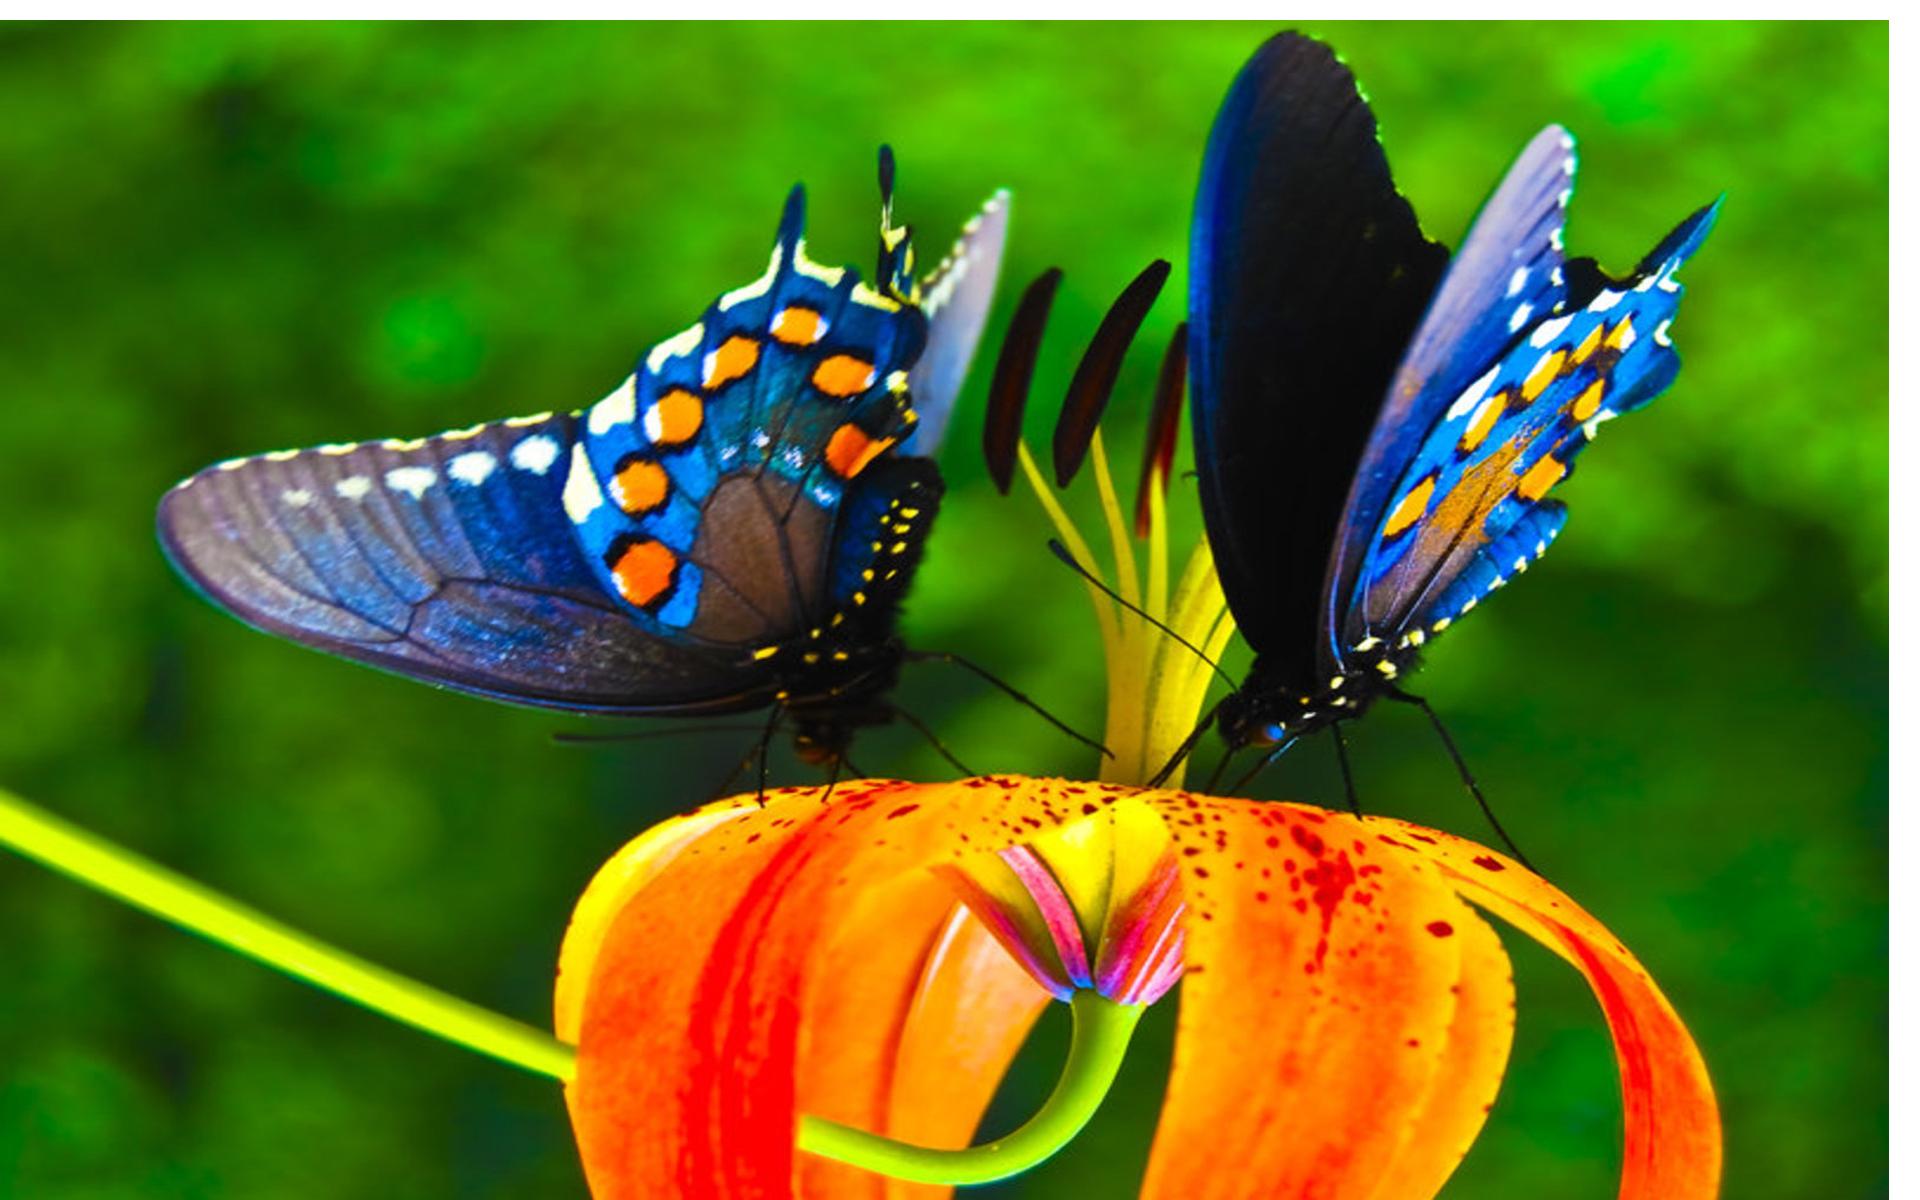 47+ Colorful Butterflies Wallpaper on WallpaperSafari